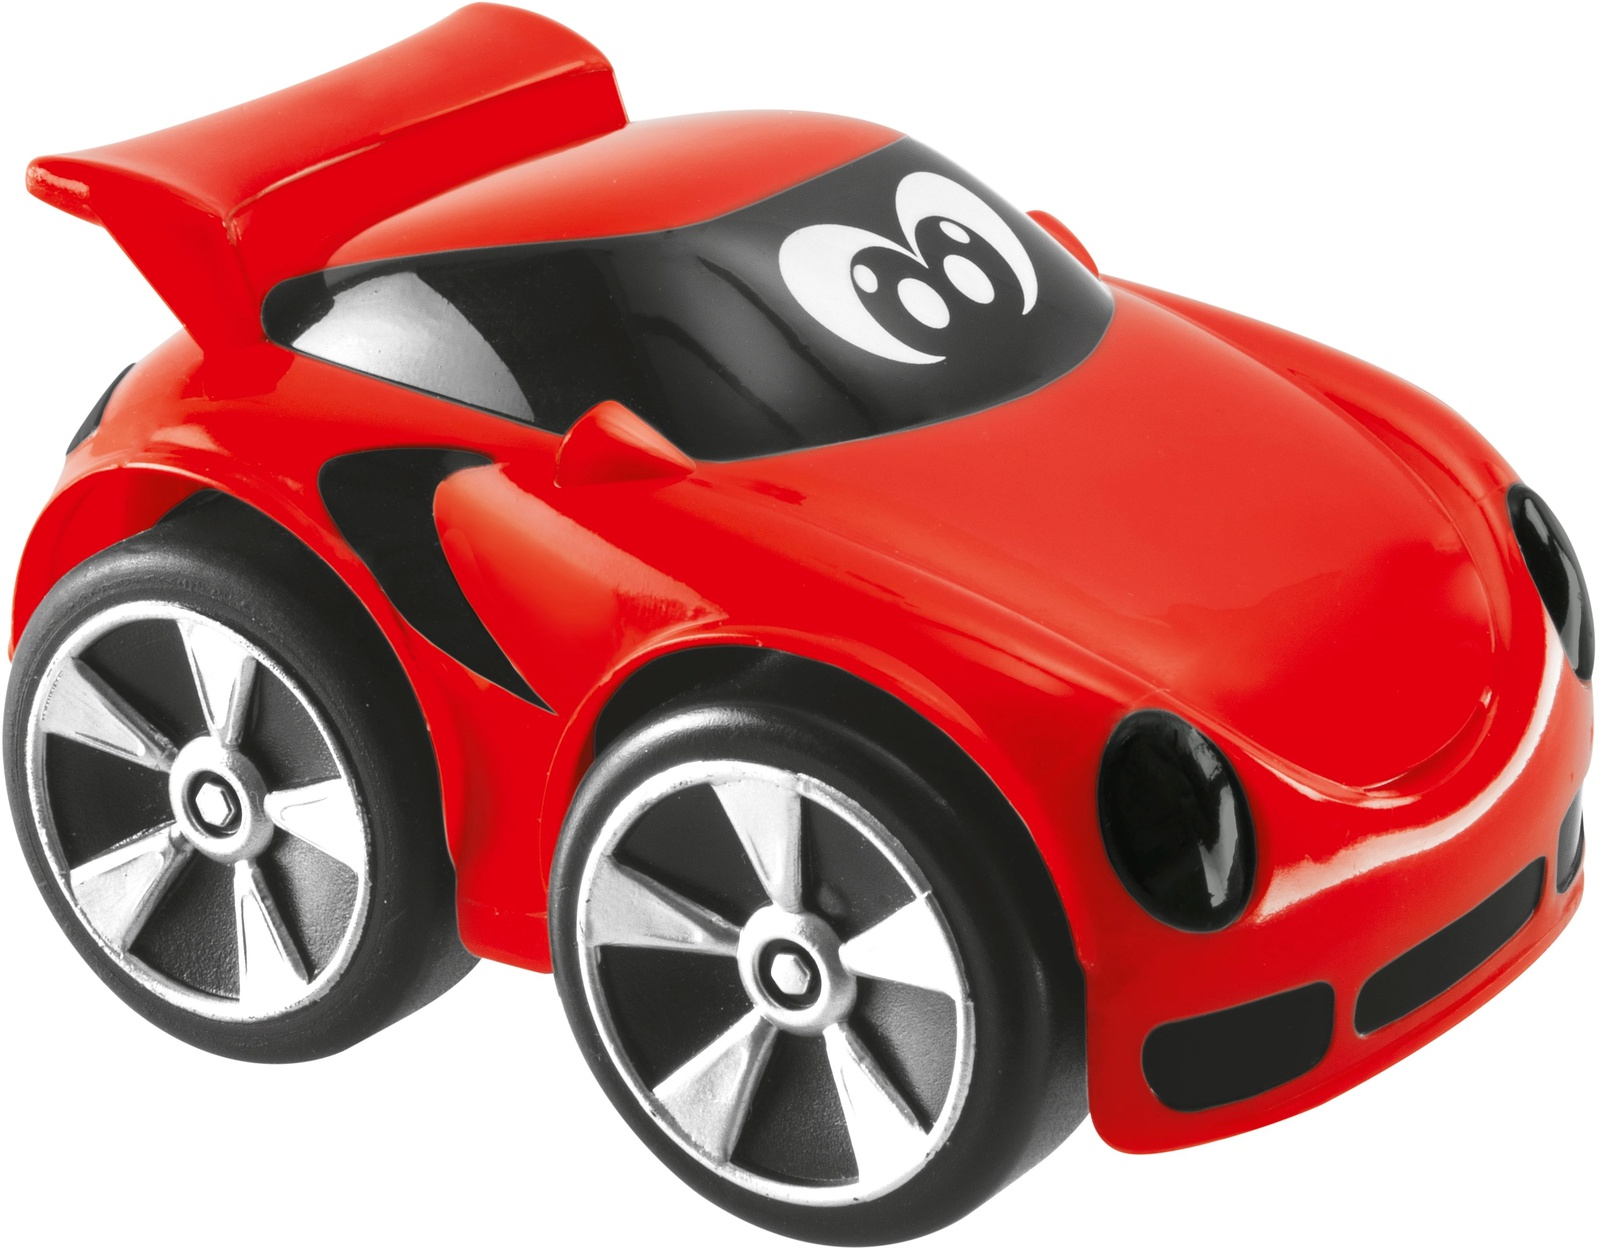 Машинка-игрушка Chicco Turbo Touch Redy красный цена